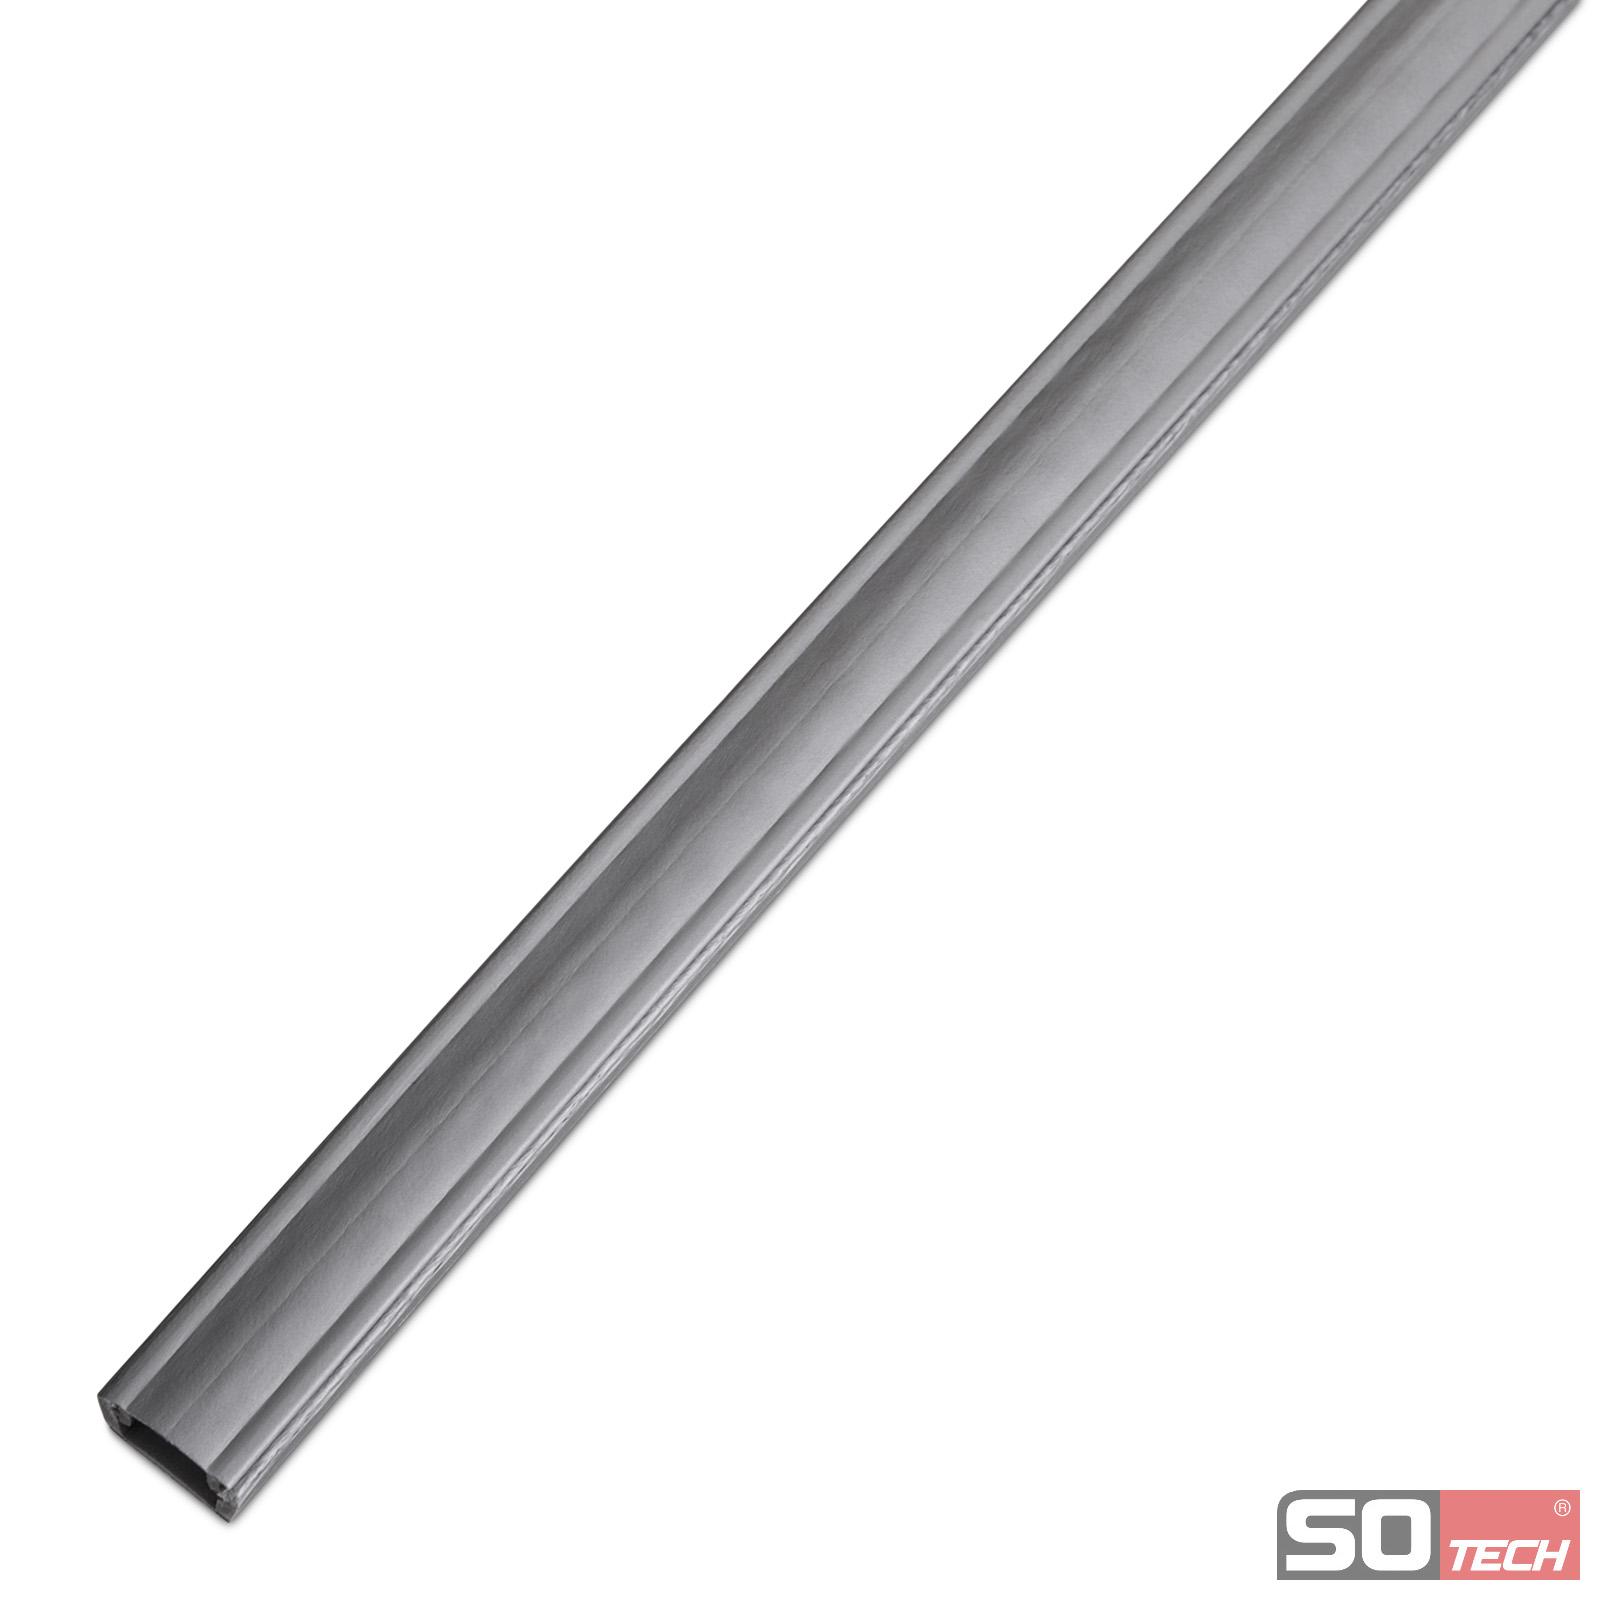 2 St/ück SO-TECH/® Kunststoff Kabeldurchf/ührung Kabeldurchlass /Ø 60 mm hellgrau